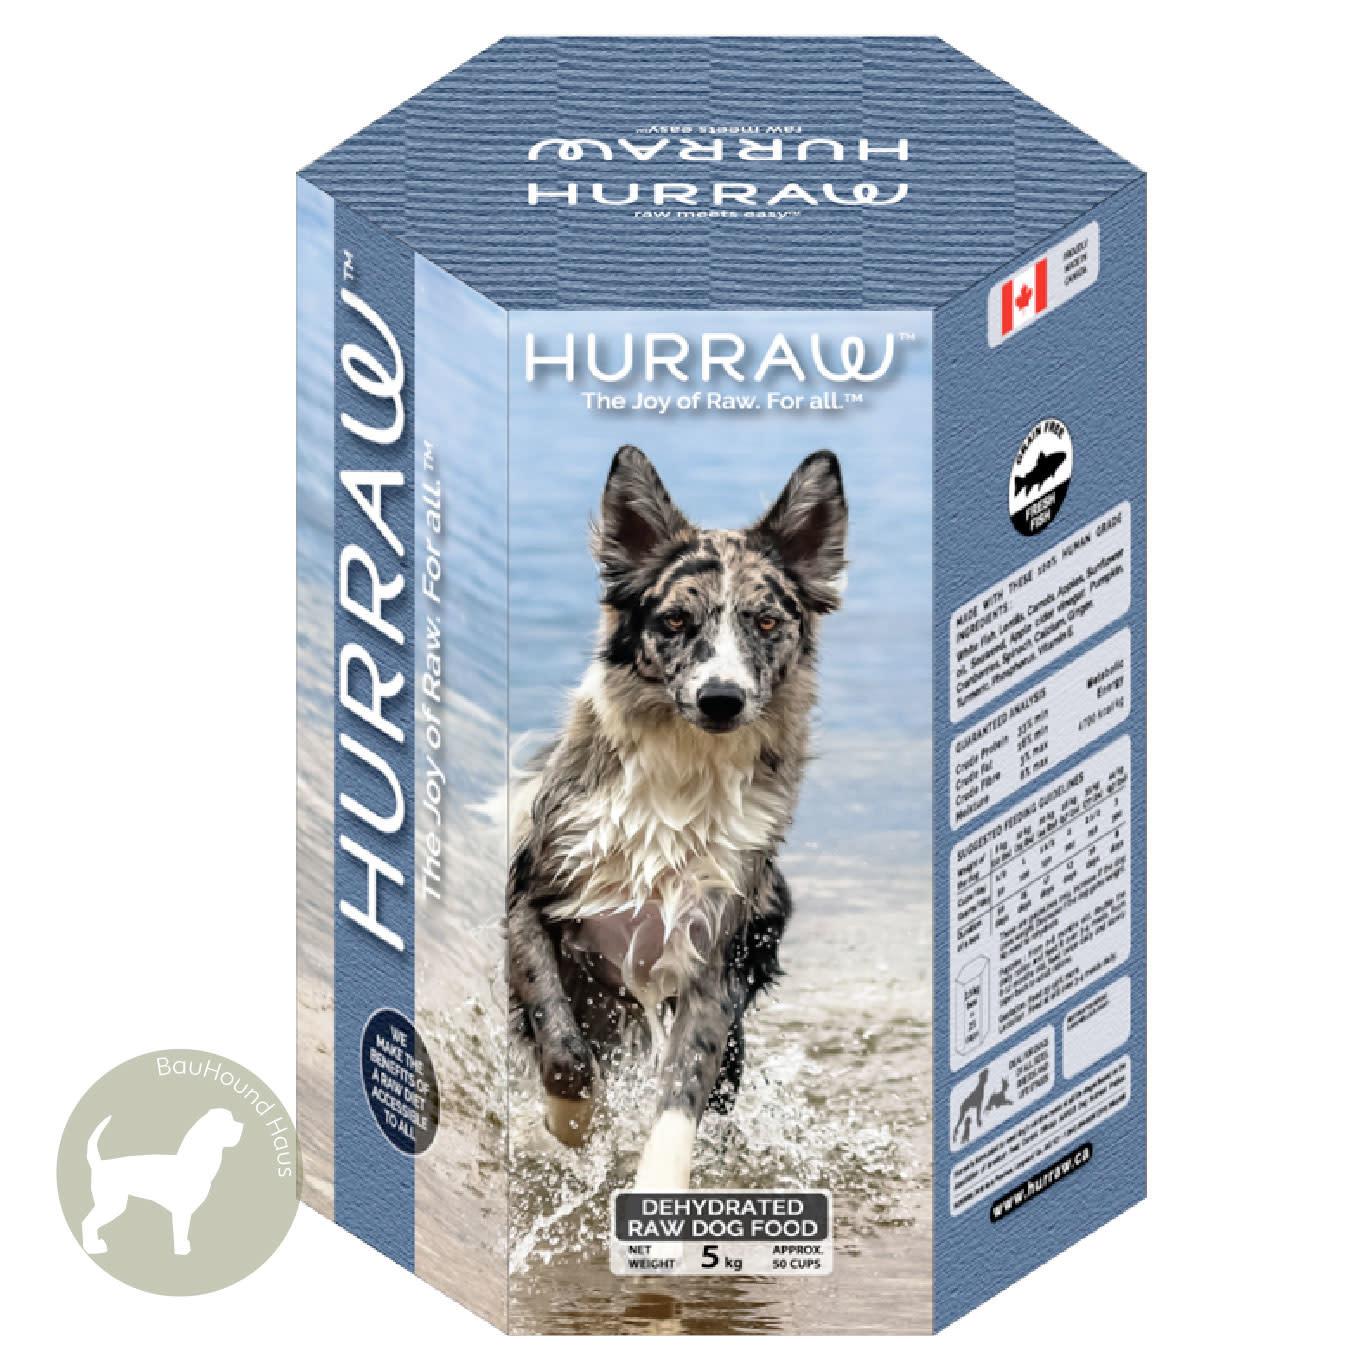 Hurraw Hurraw Dehydrated Raw Dog Food FRESH FISH, 2.5kg